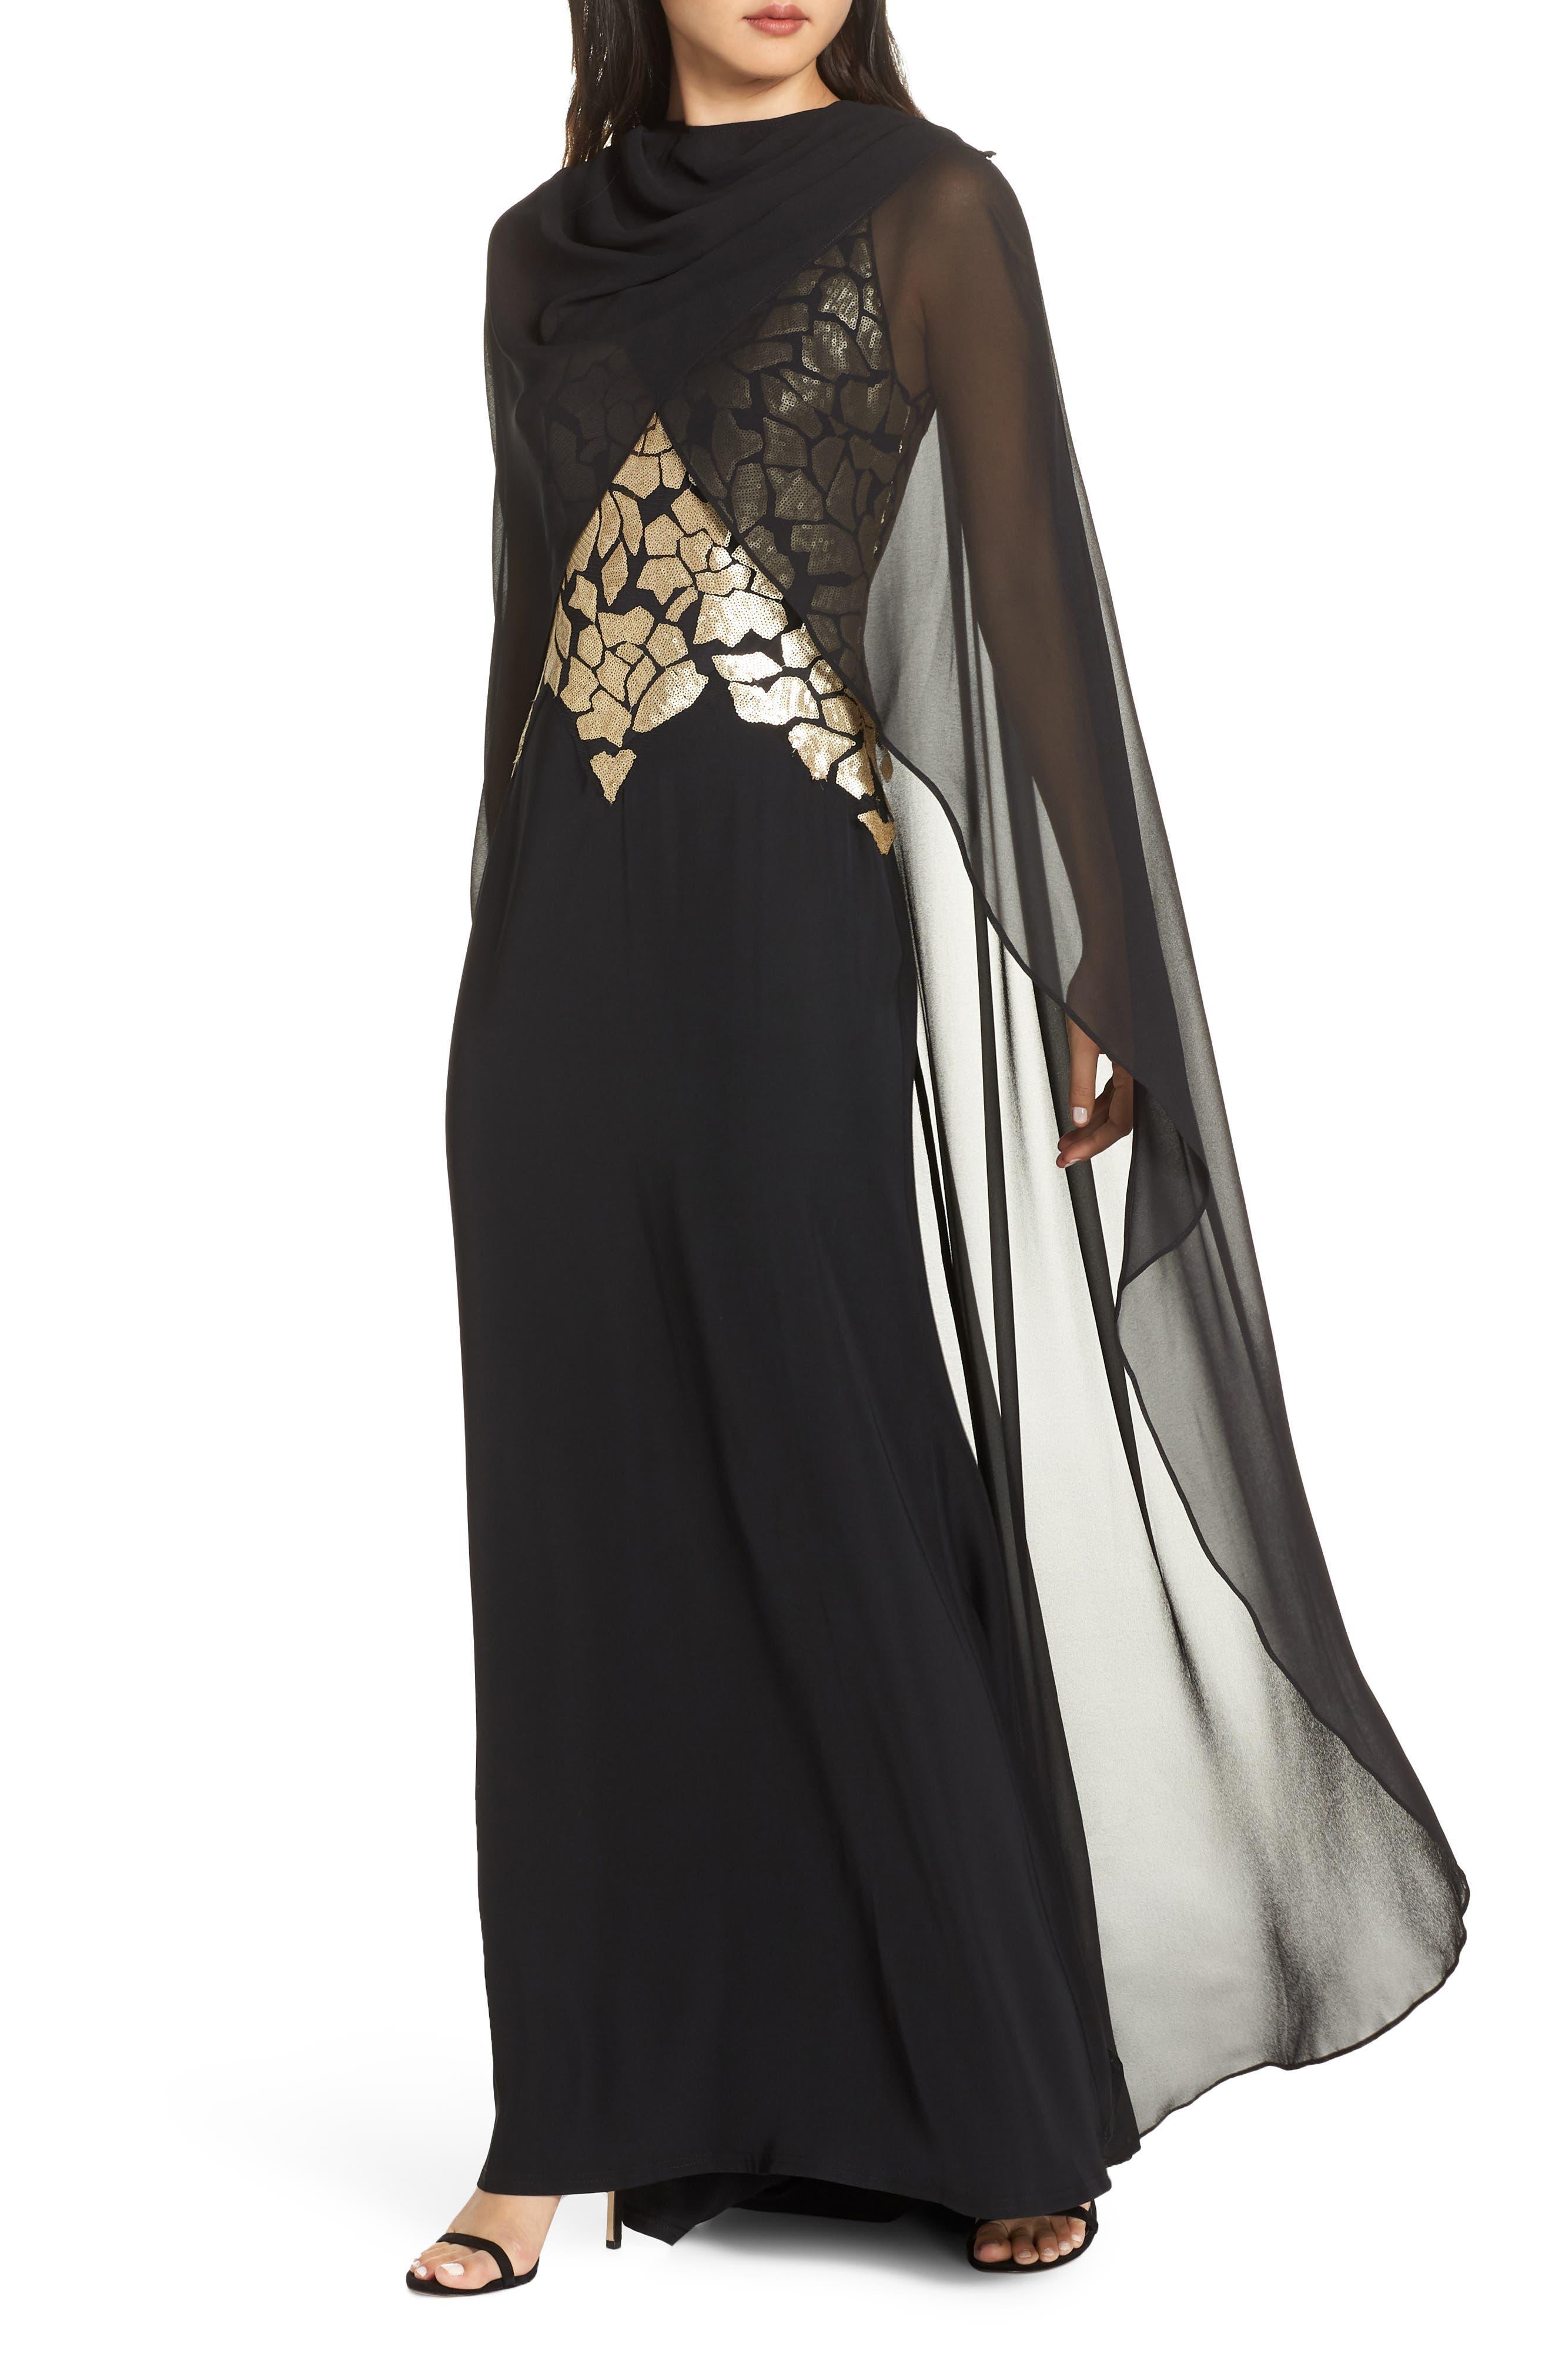 Shawl for Dress